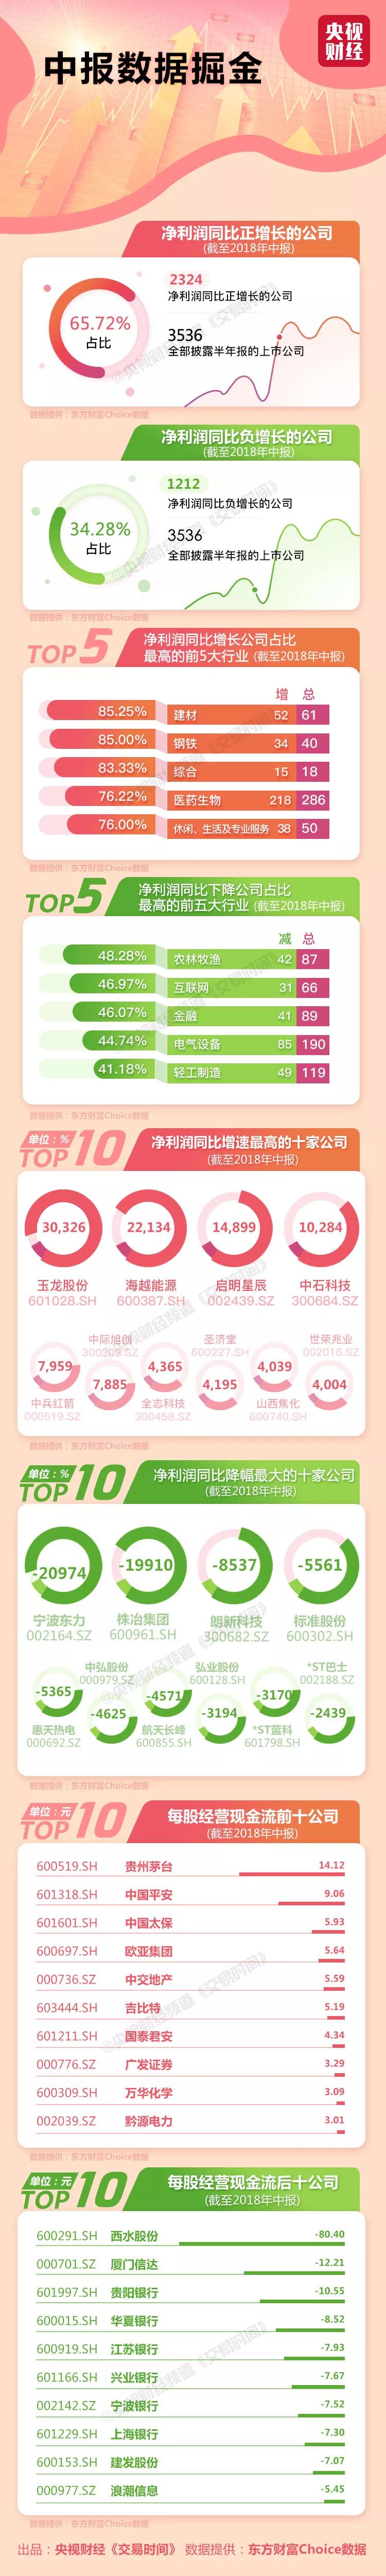 A股中报上市公司TOP10出炉:最赚钱的是它 日赚近9亿